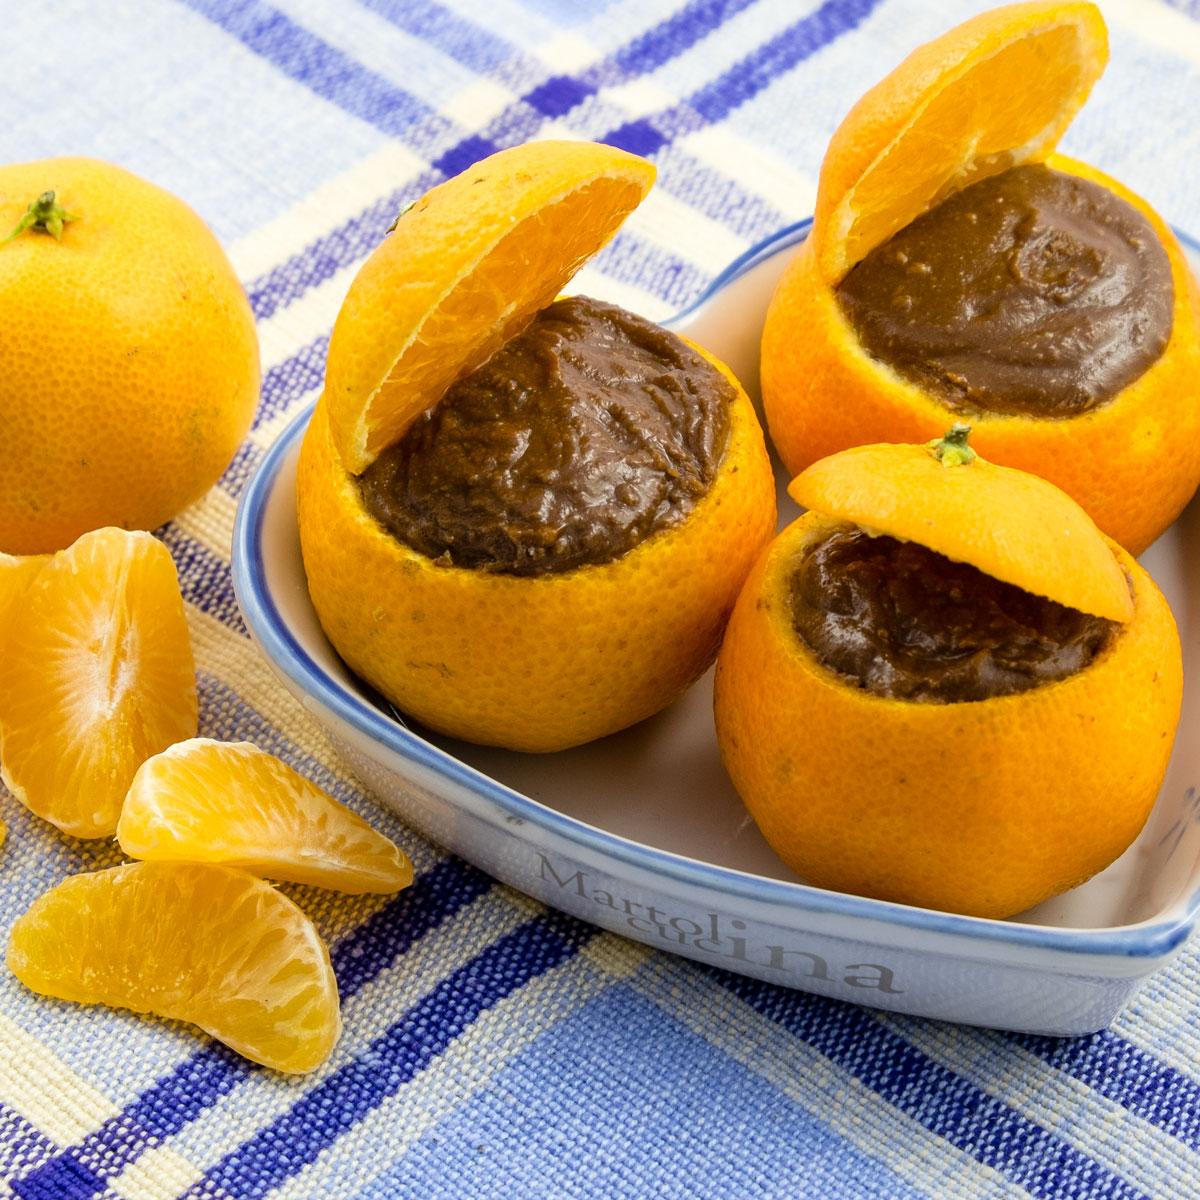 Mousse-al-mandarino-e-cioccolato-fondente-A1200x1200